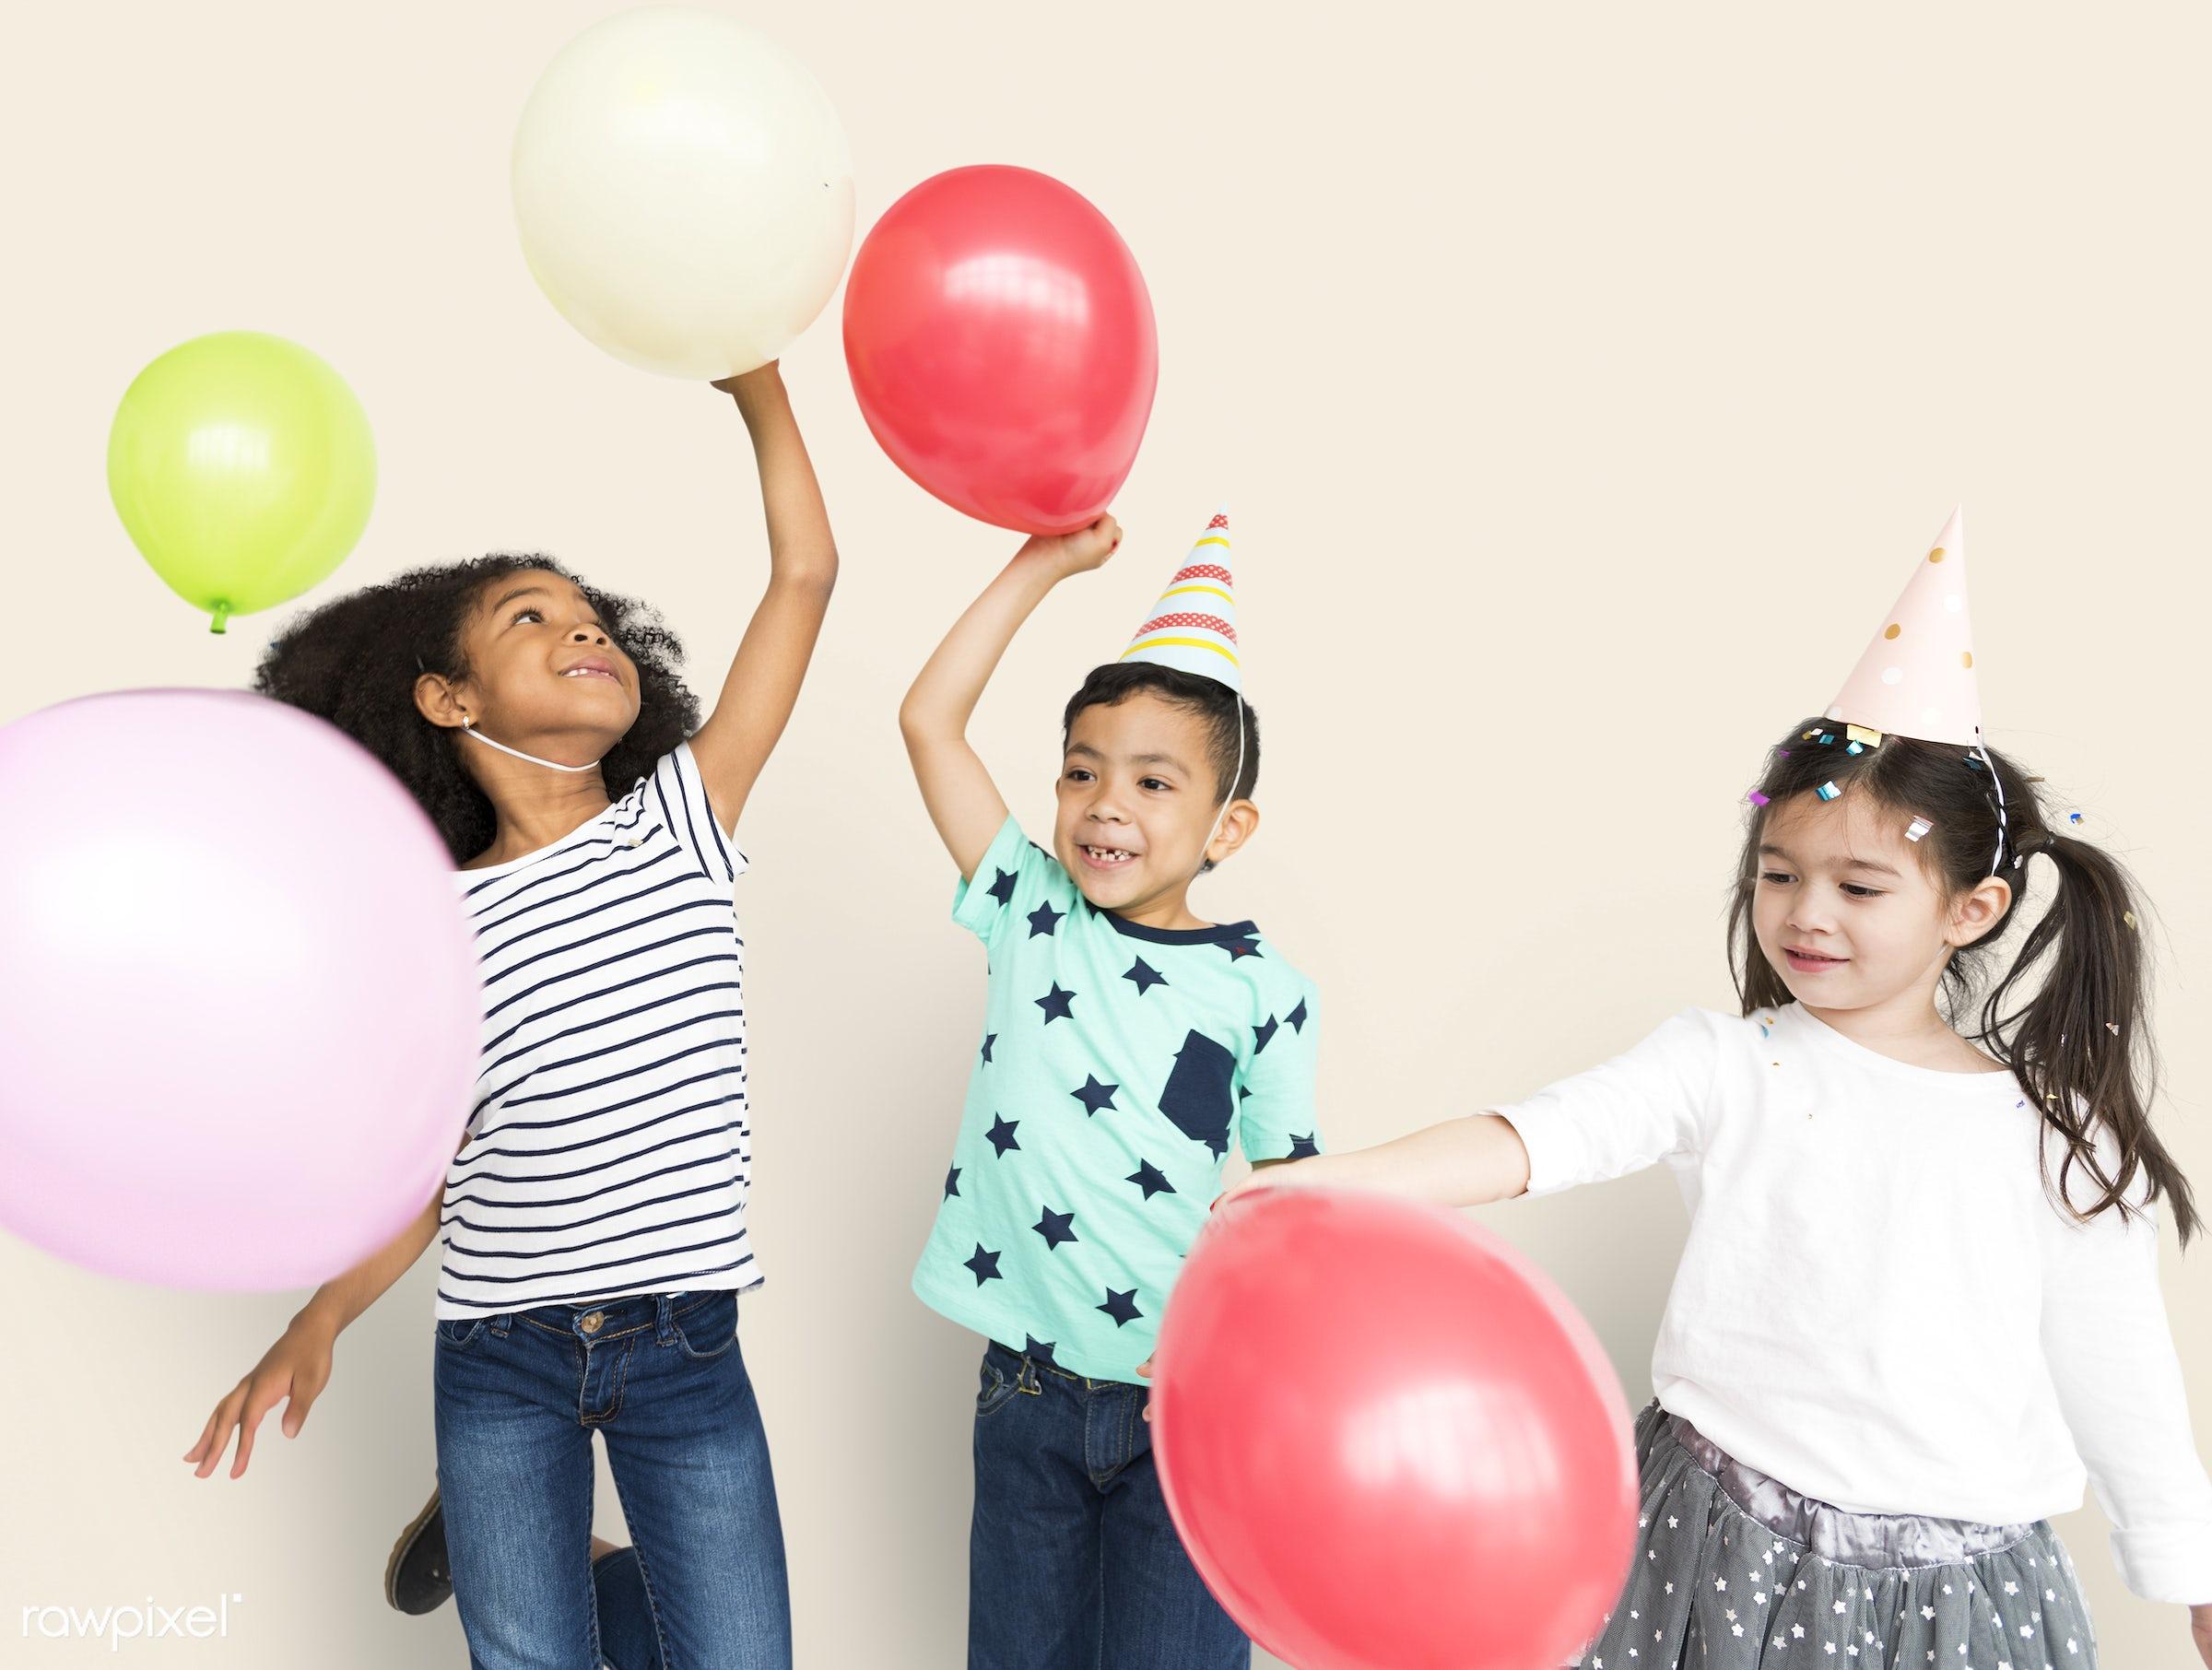 adorable, background, balloon, boy, casual, celebration, child, children, color, colorful, cute, decoration, diverse,...